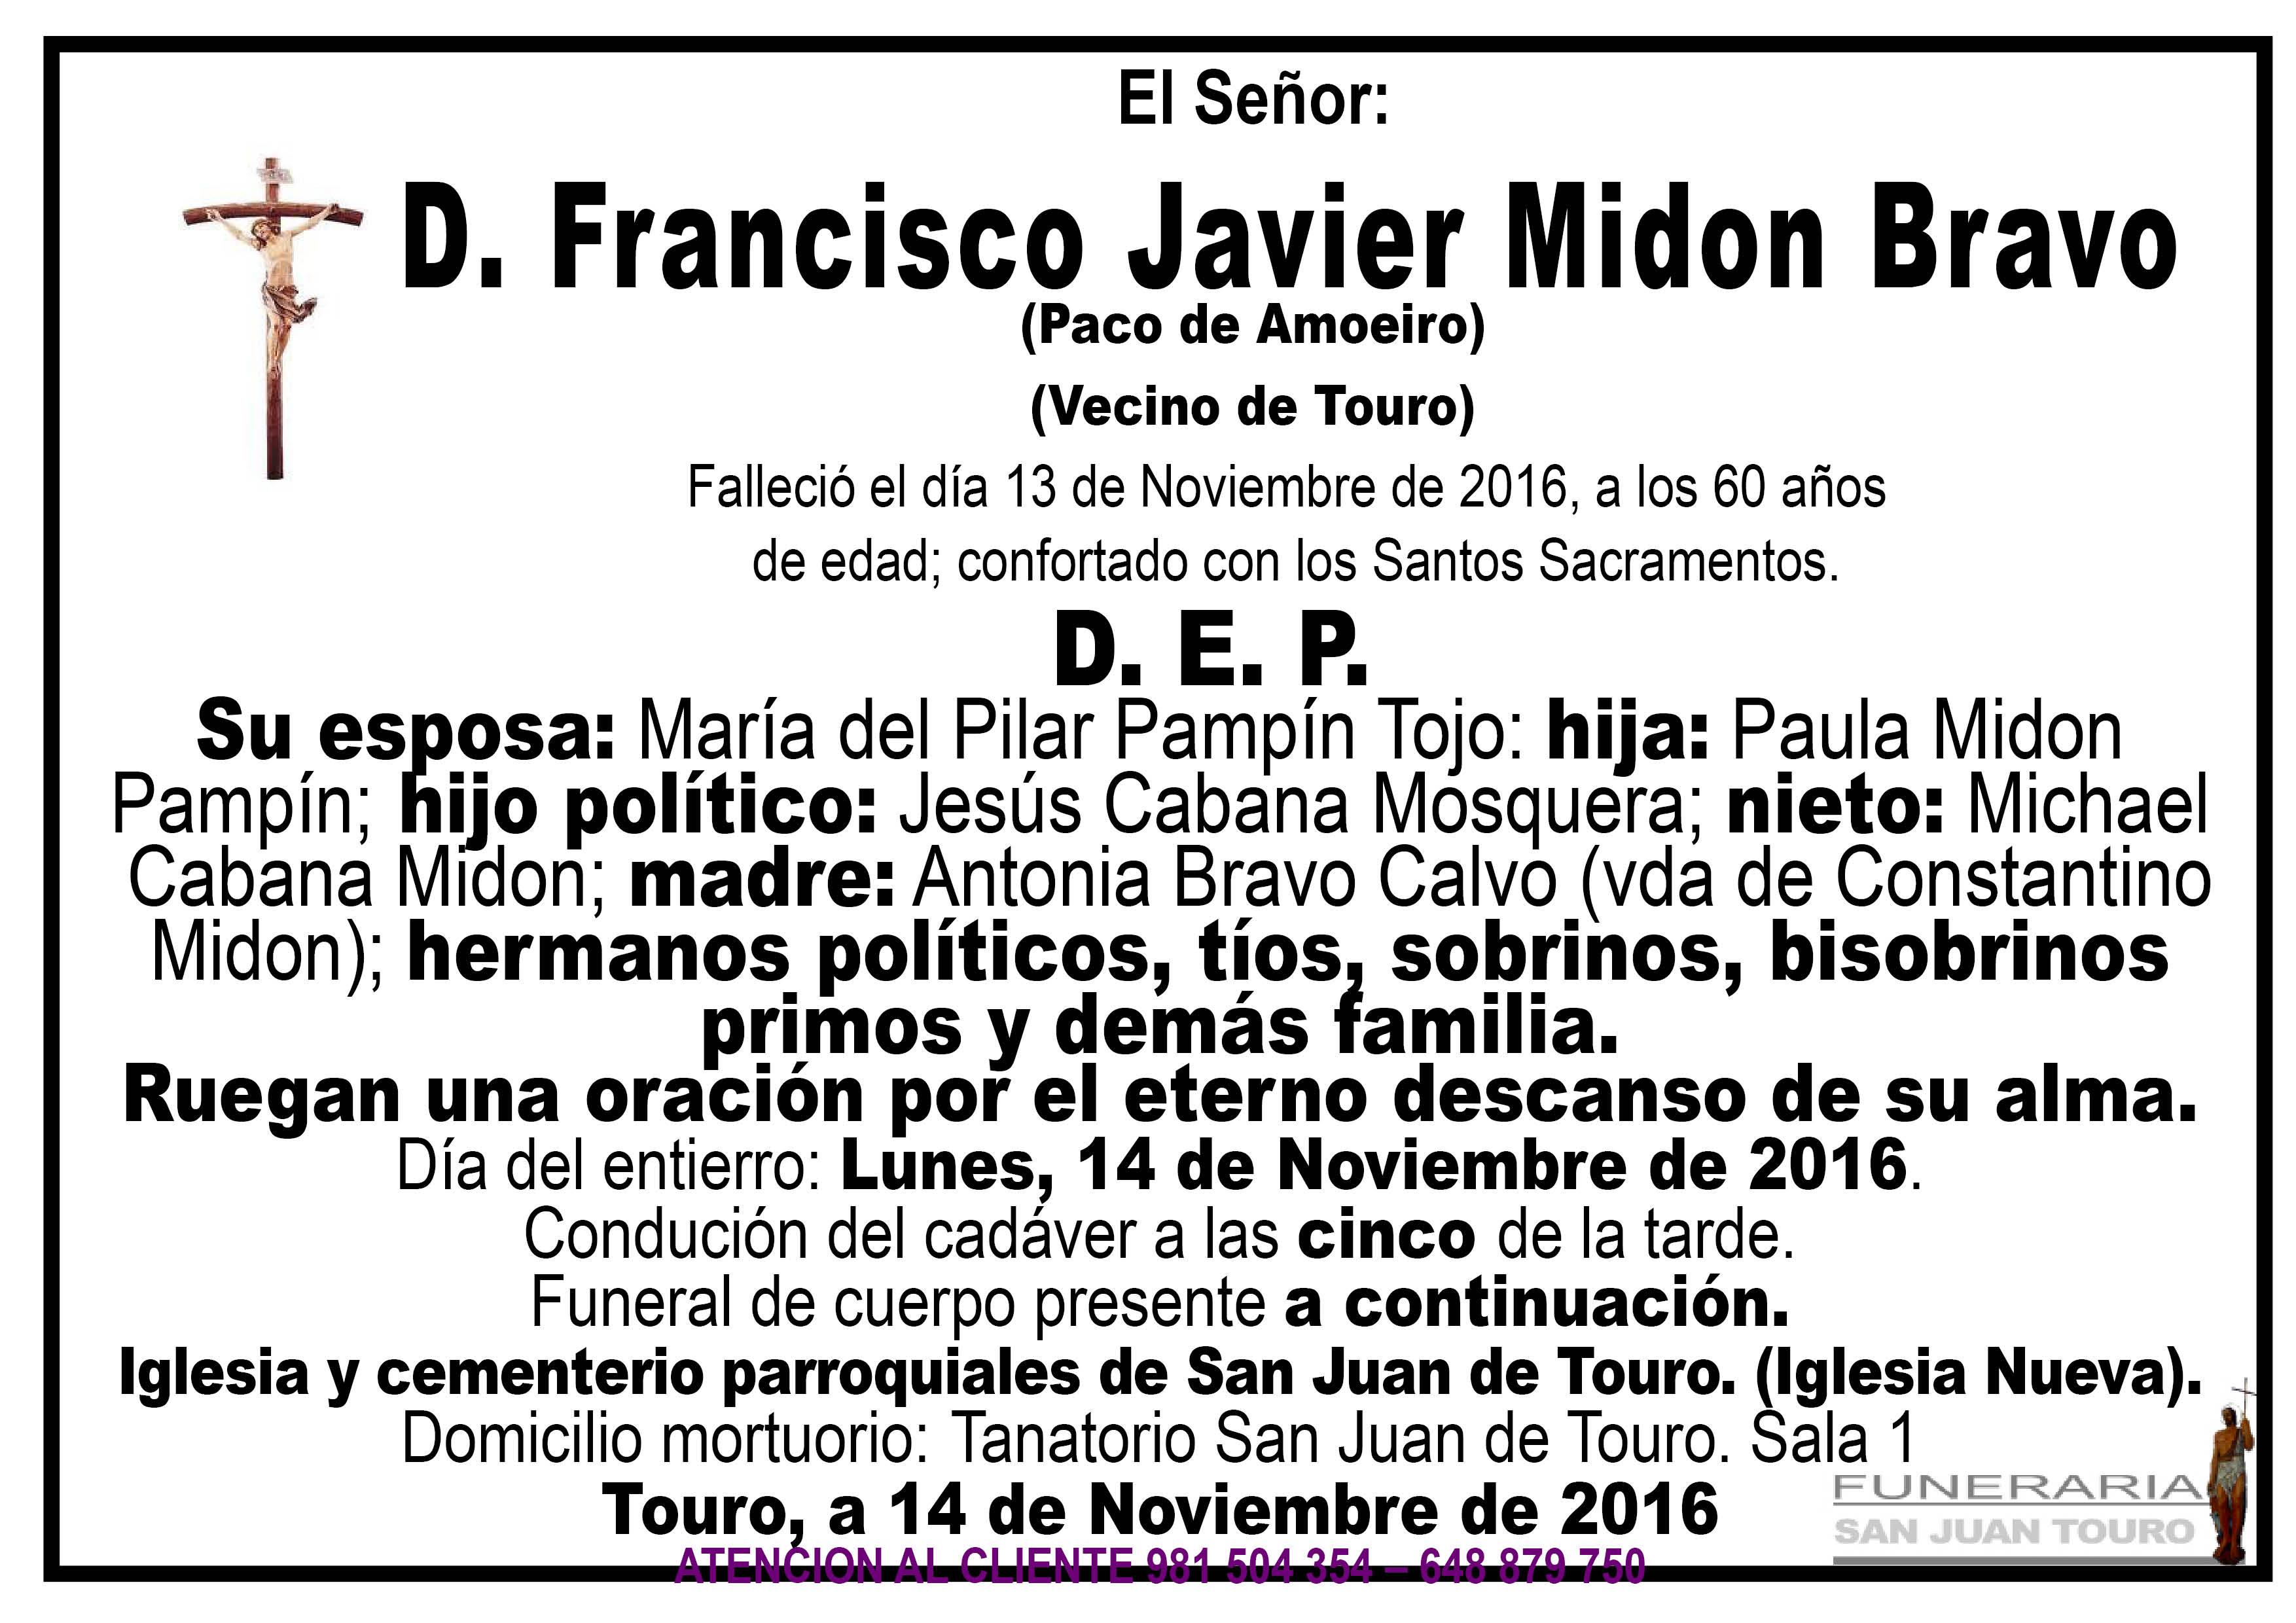 Esquela de SEPELIO D FRANCISCO JAVIER MIDON BRAVO